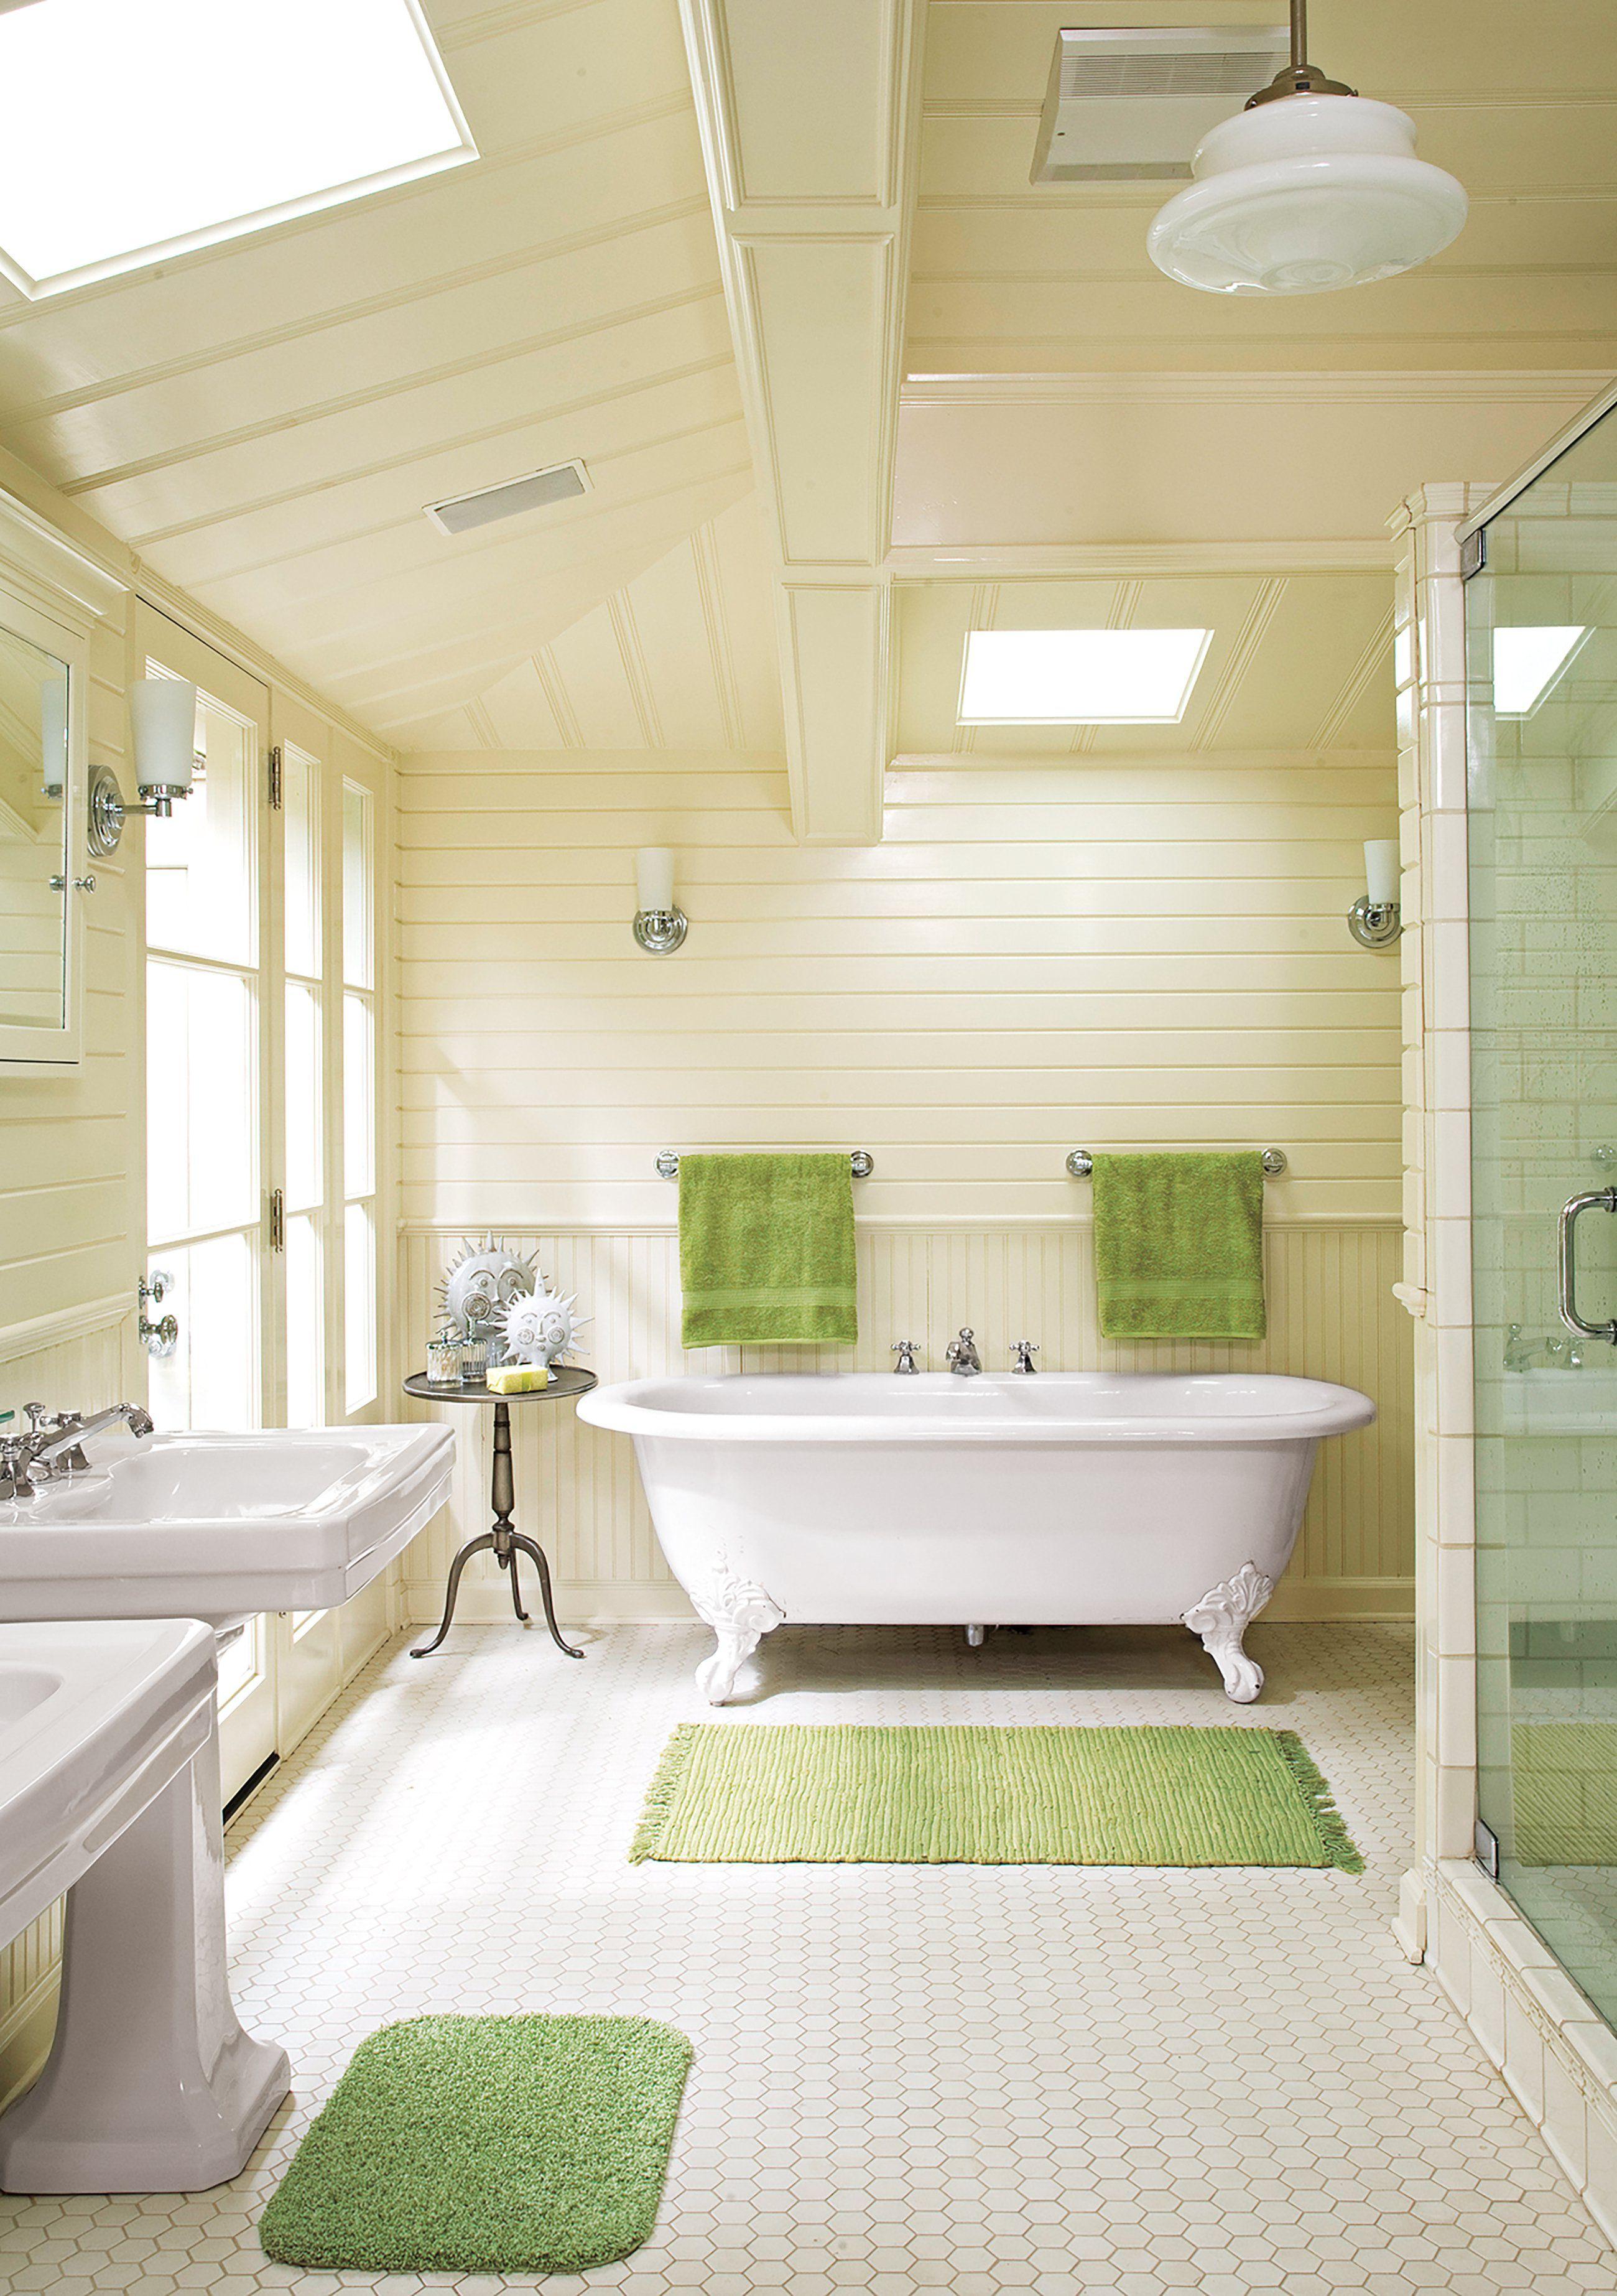 Read This Before You Redo a Bath | Green bathroom decor ...